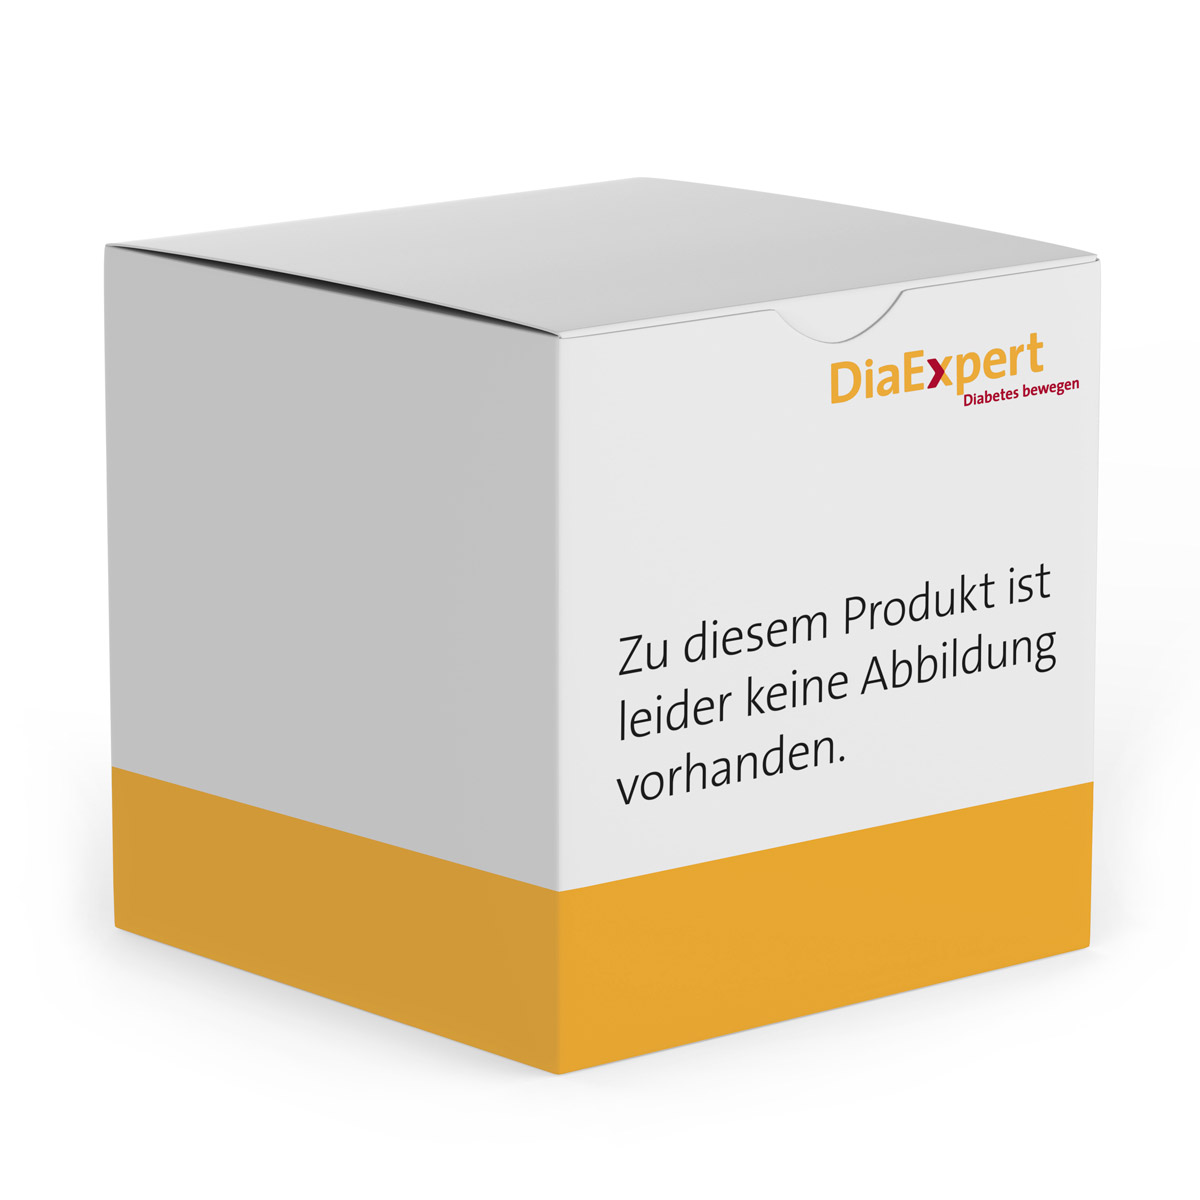 Diastix Teststreifen